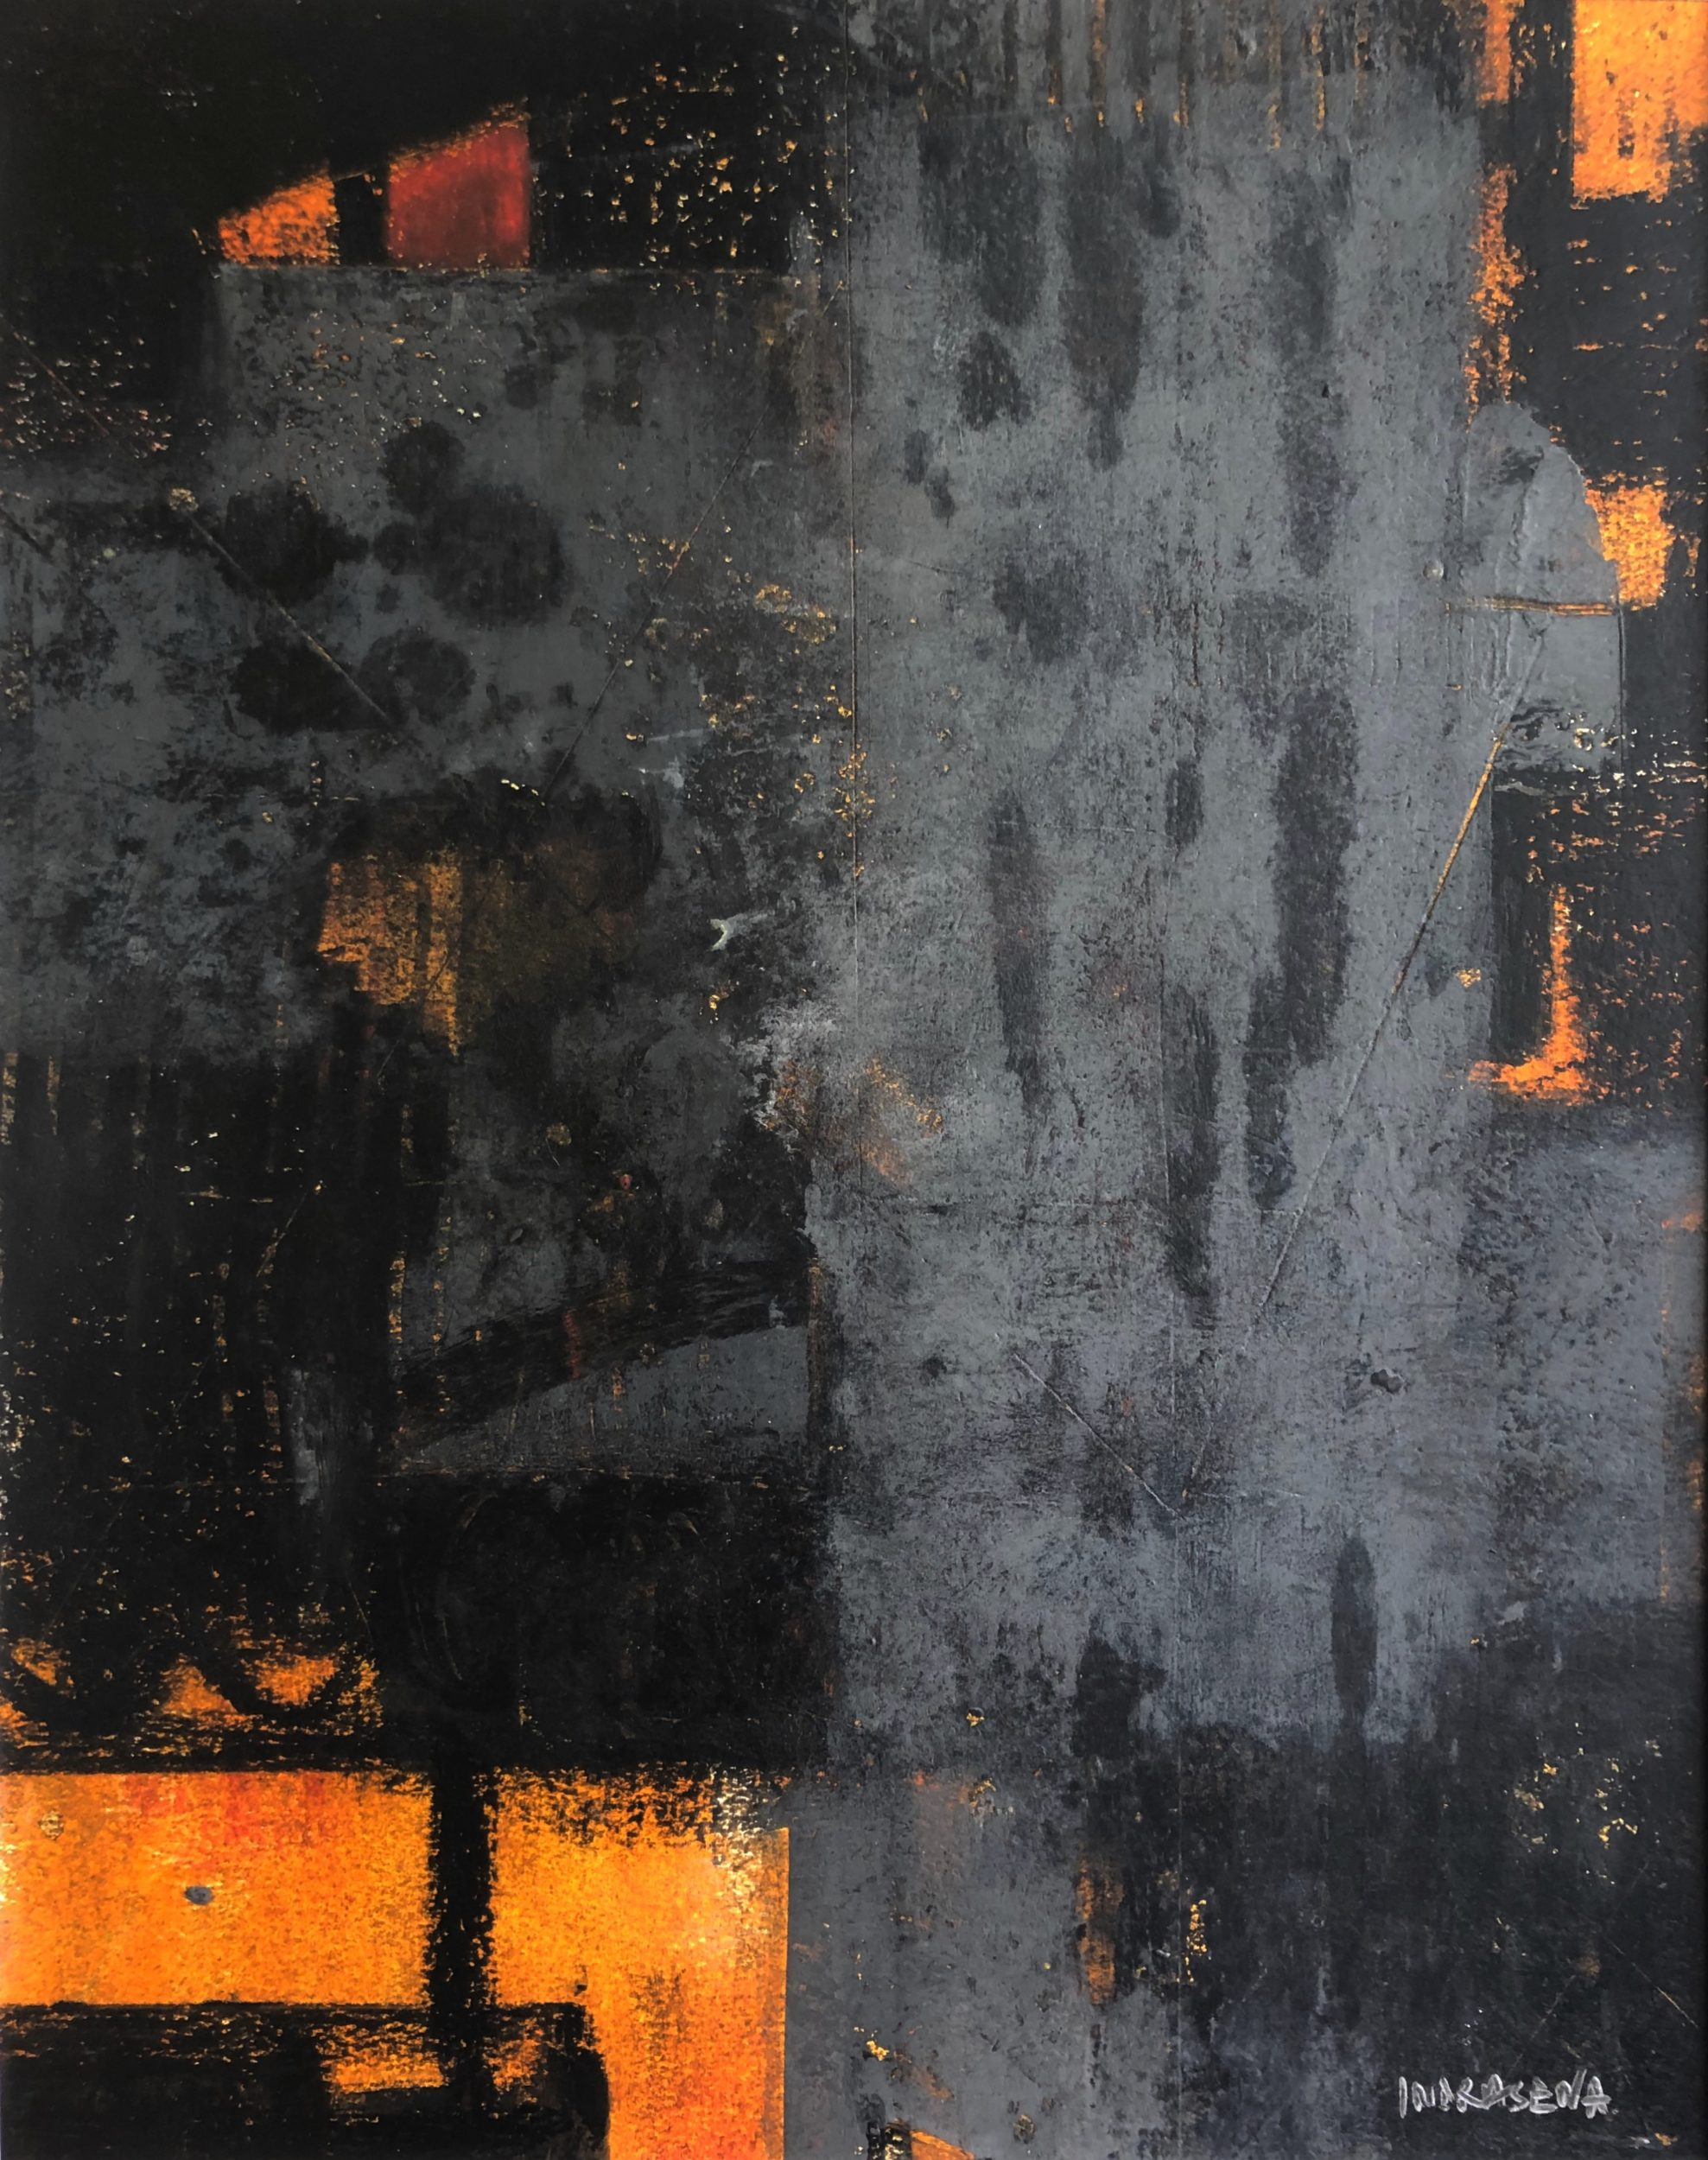 Nightfall 40x50 ColdWax & Oil